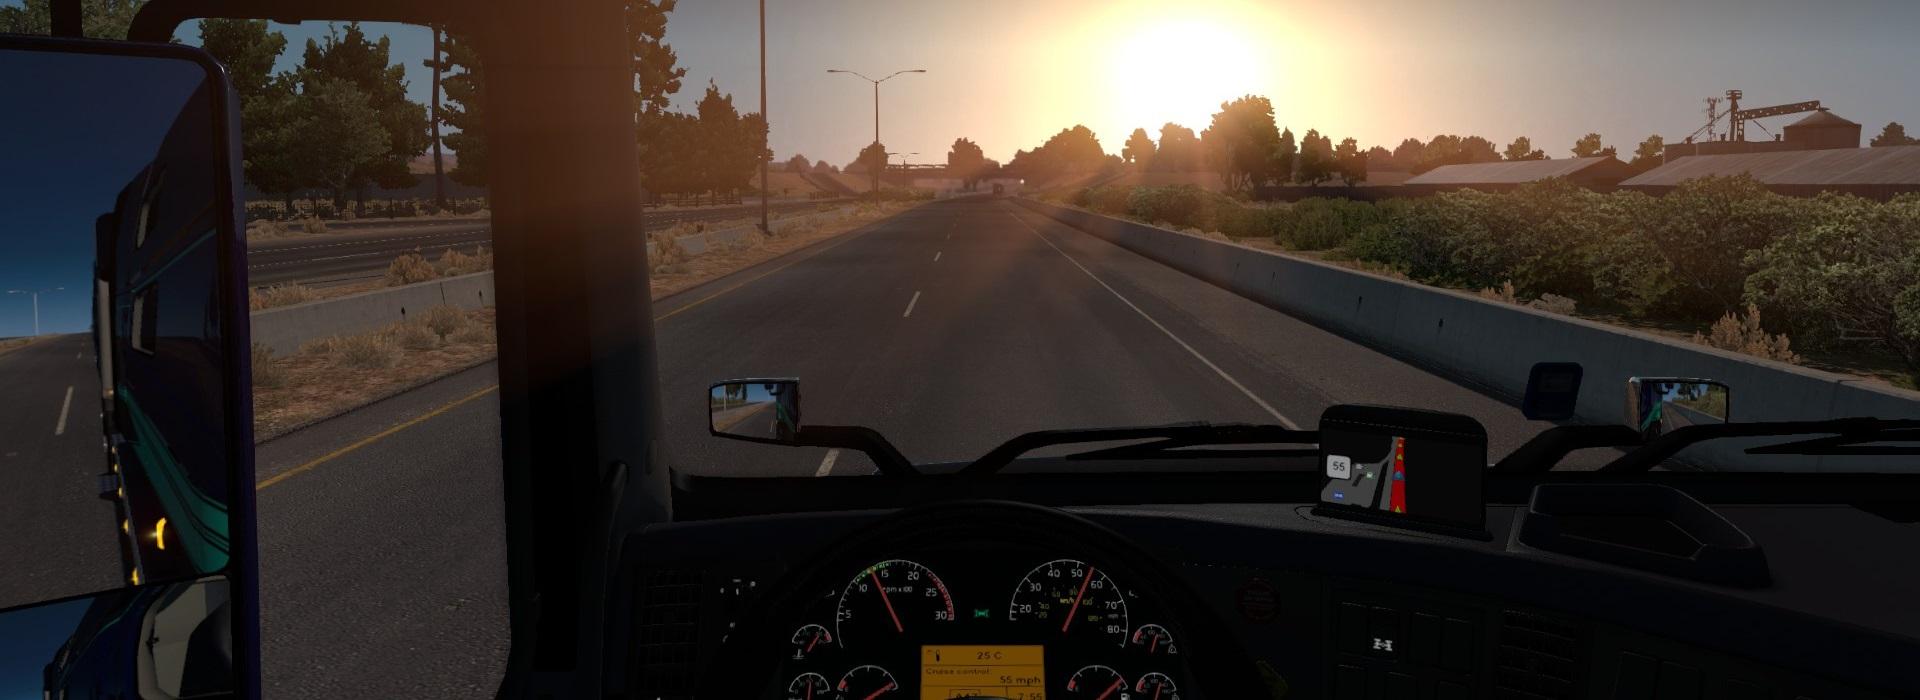 American Truck Simulator - Goodmorning!